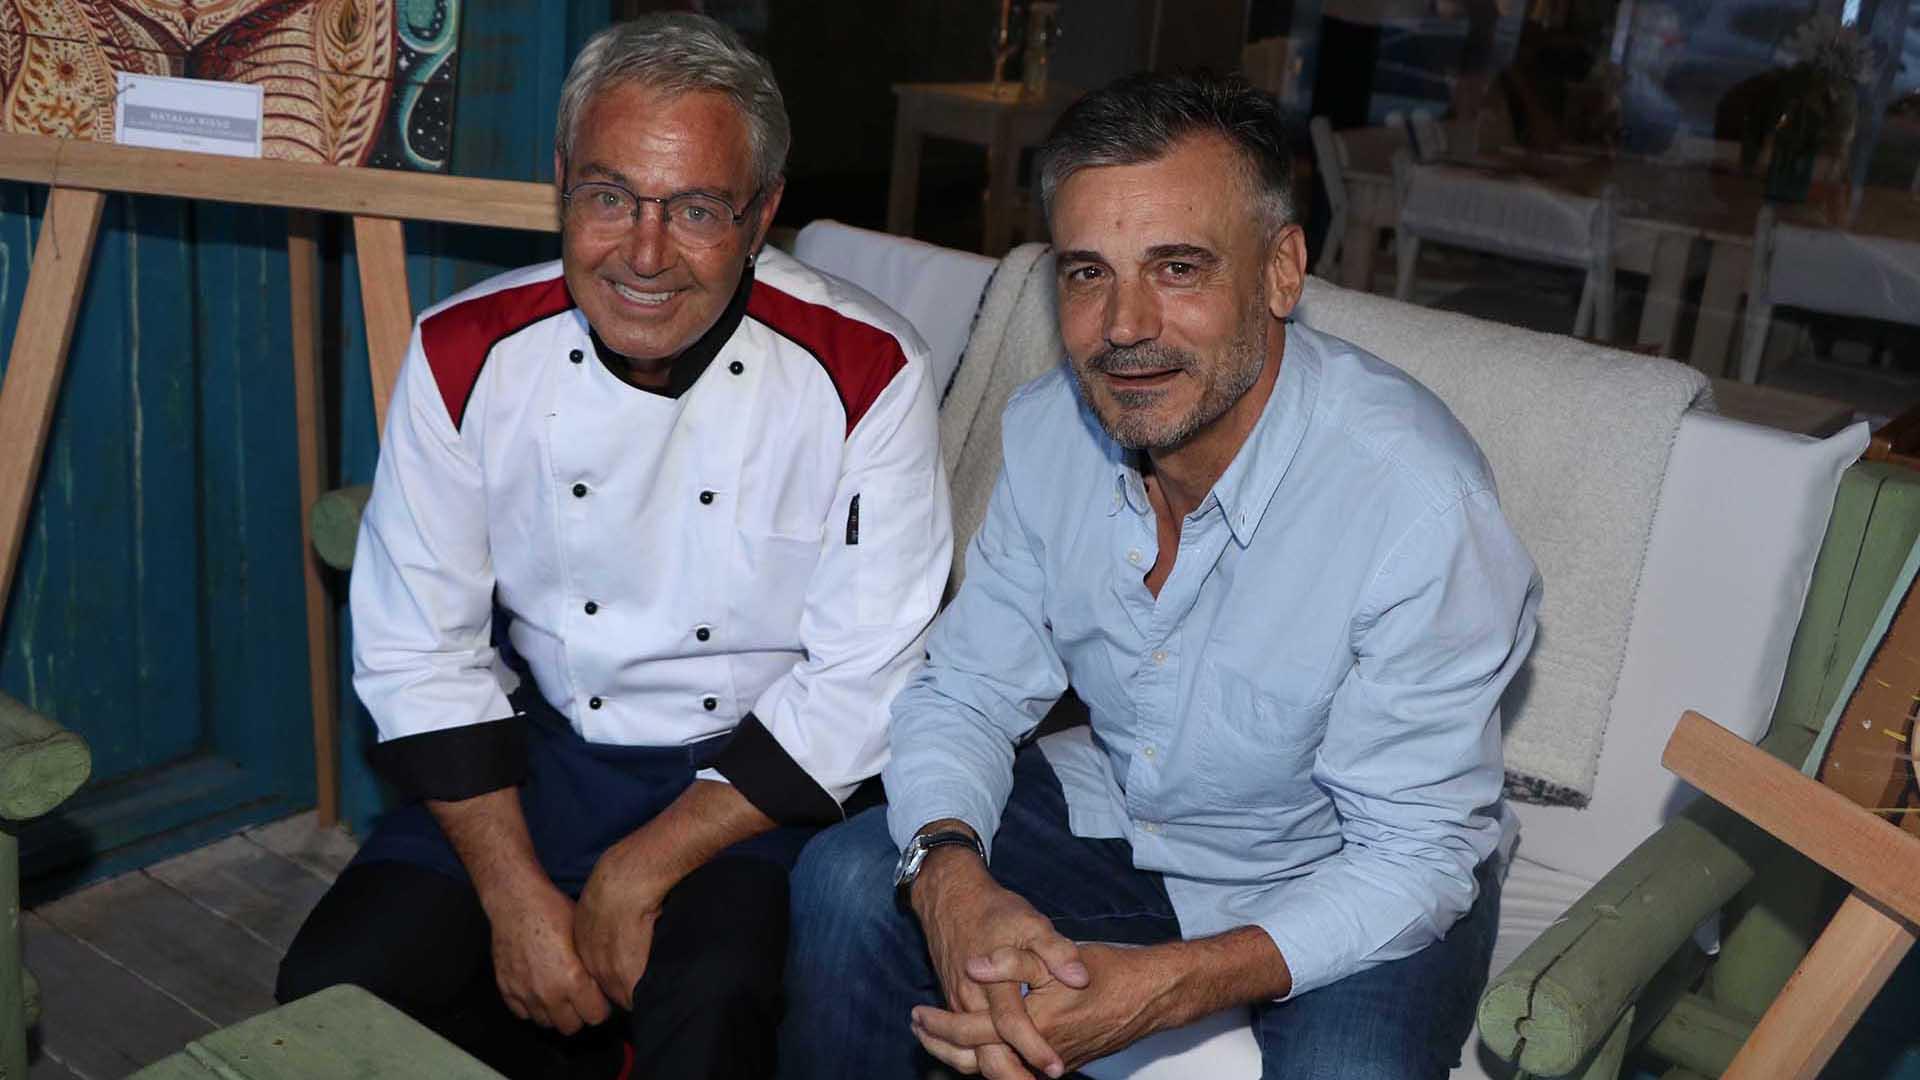 El chef ejecutivo, Alessandro Tridenti, junto a Jorge Vázquez (Foto: Matías Souto)